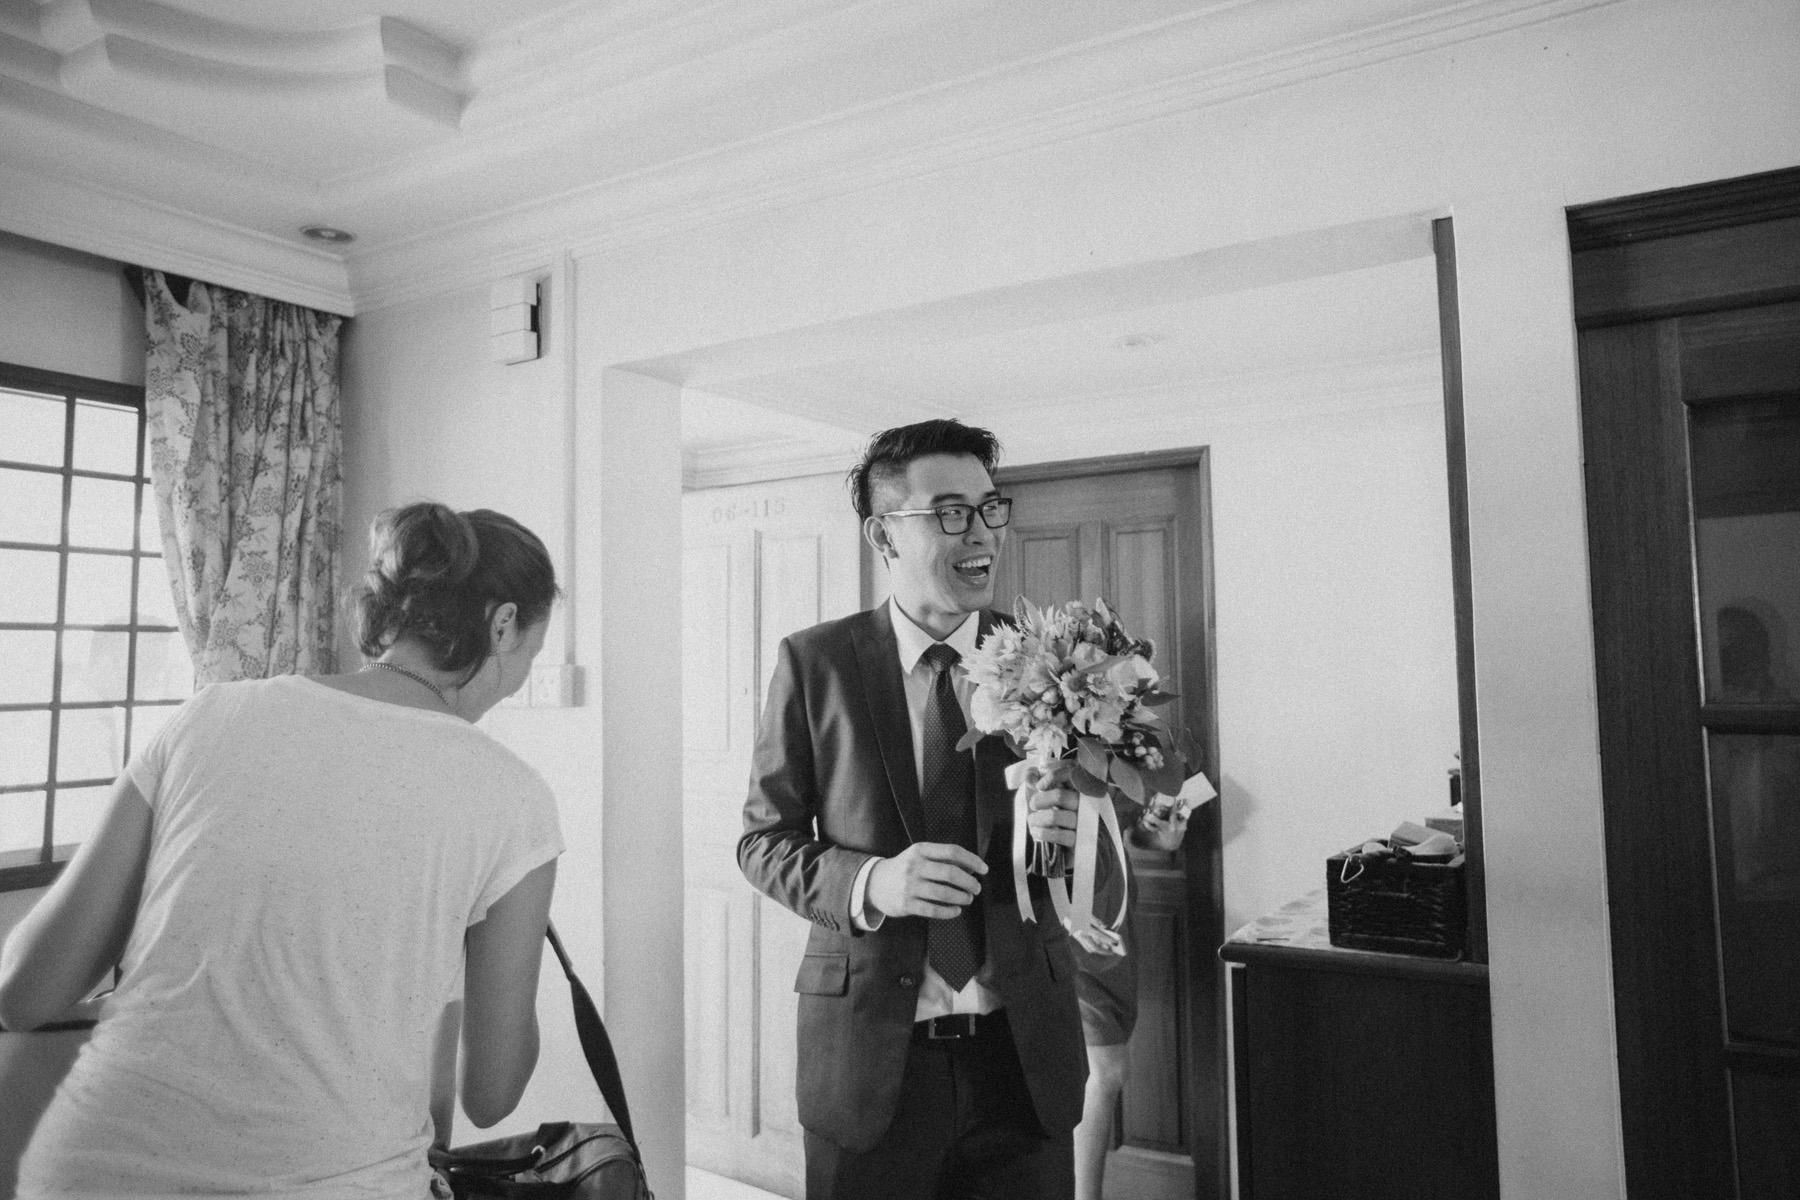 singapore-wedding-travel-photographer-faith-alvin-wedding-wmt-10.jpg